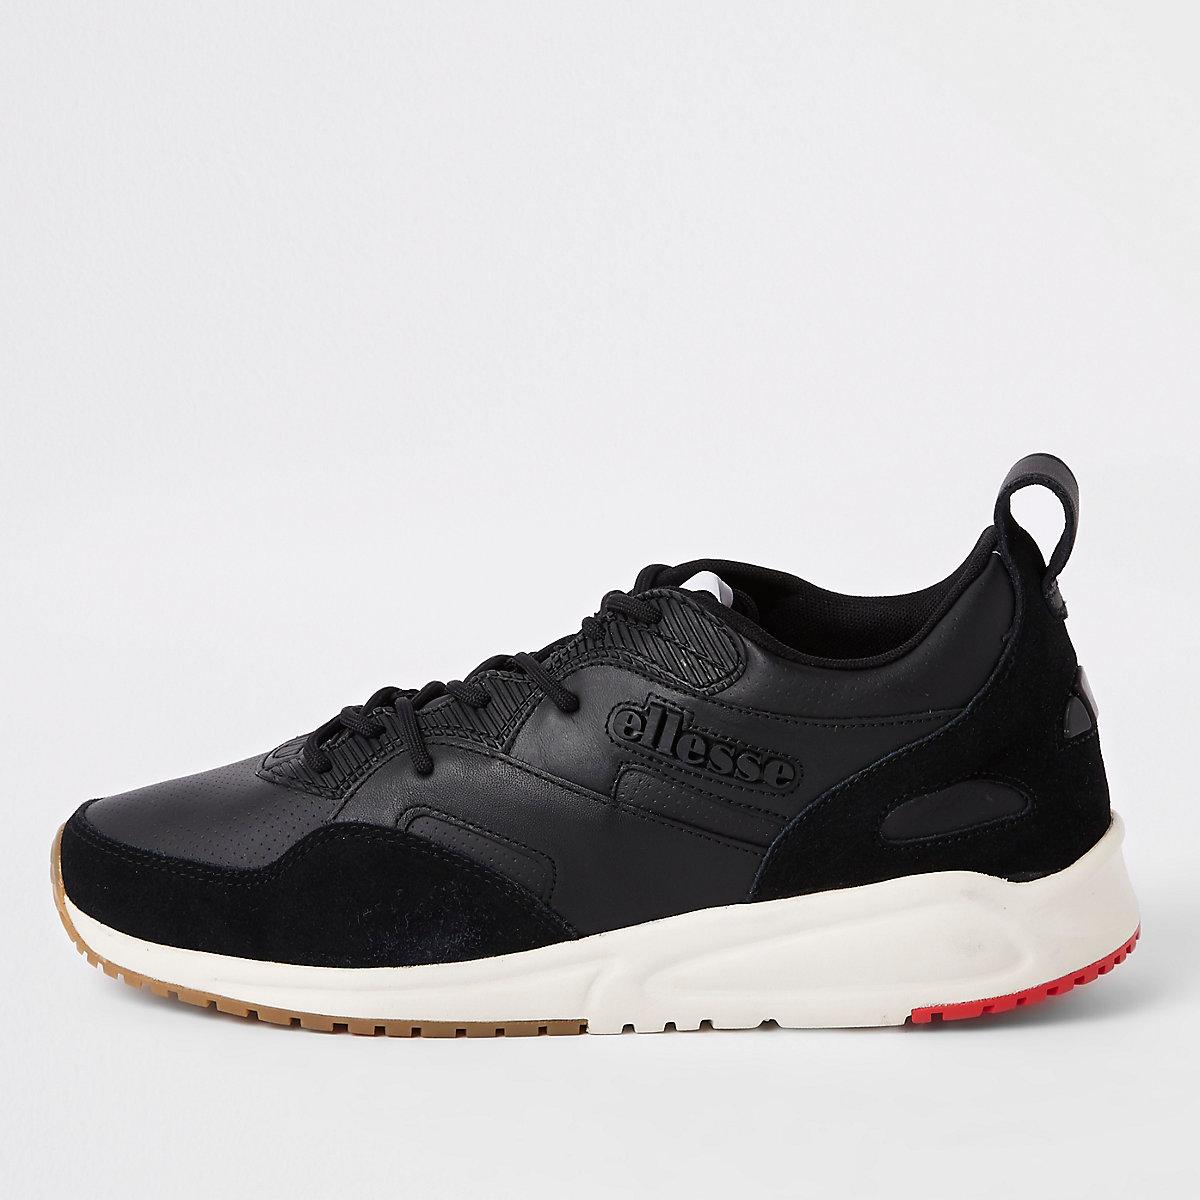 Ellesse black Potenza leather sneakers